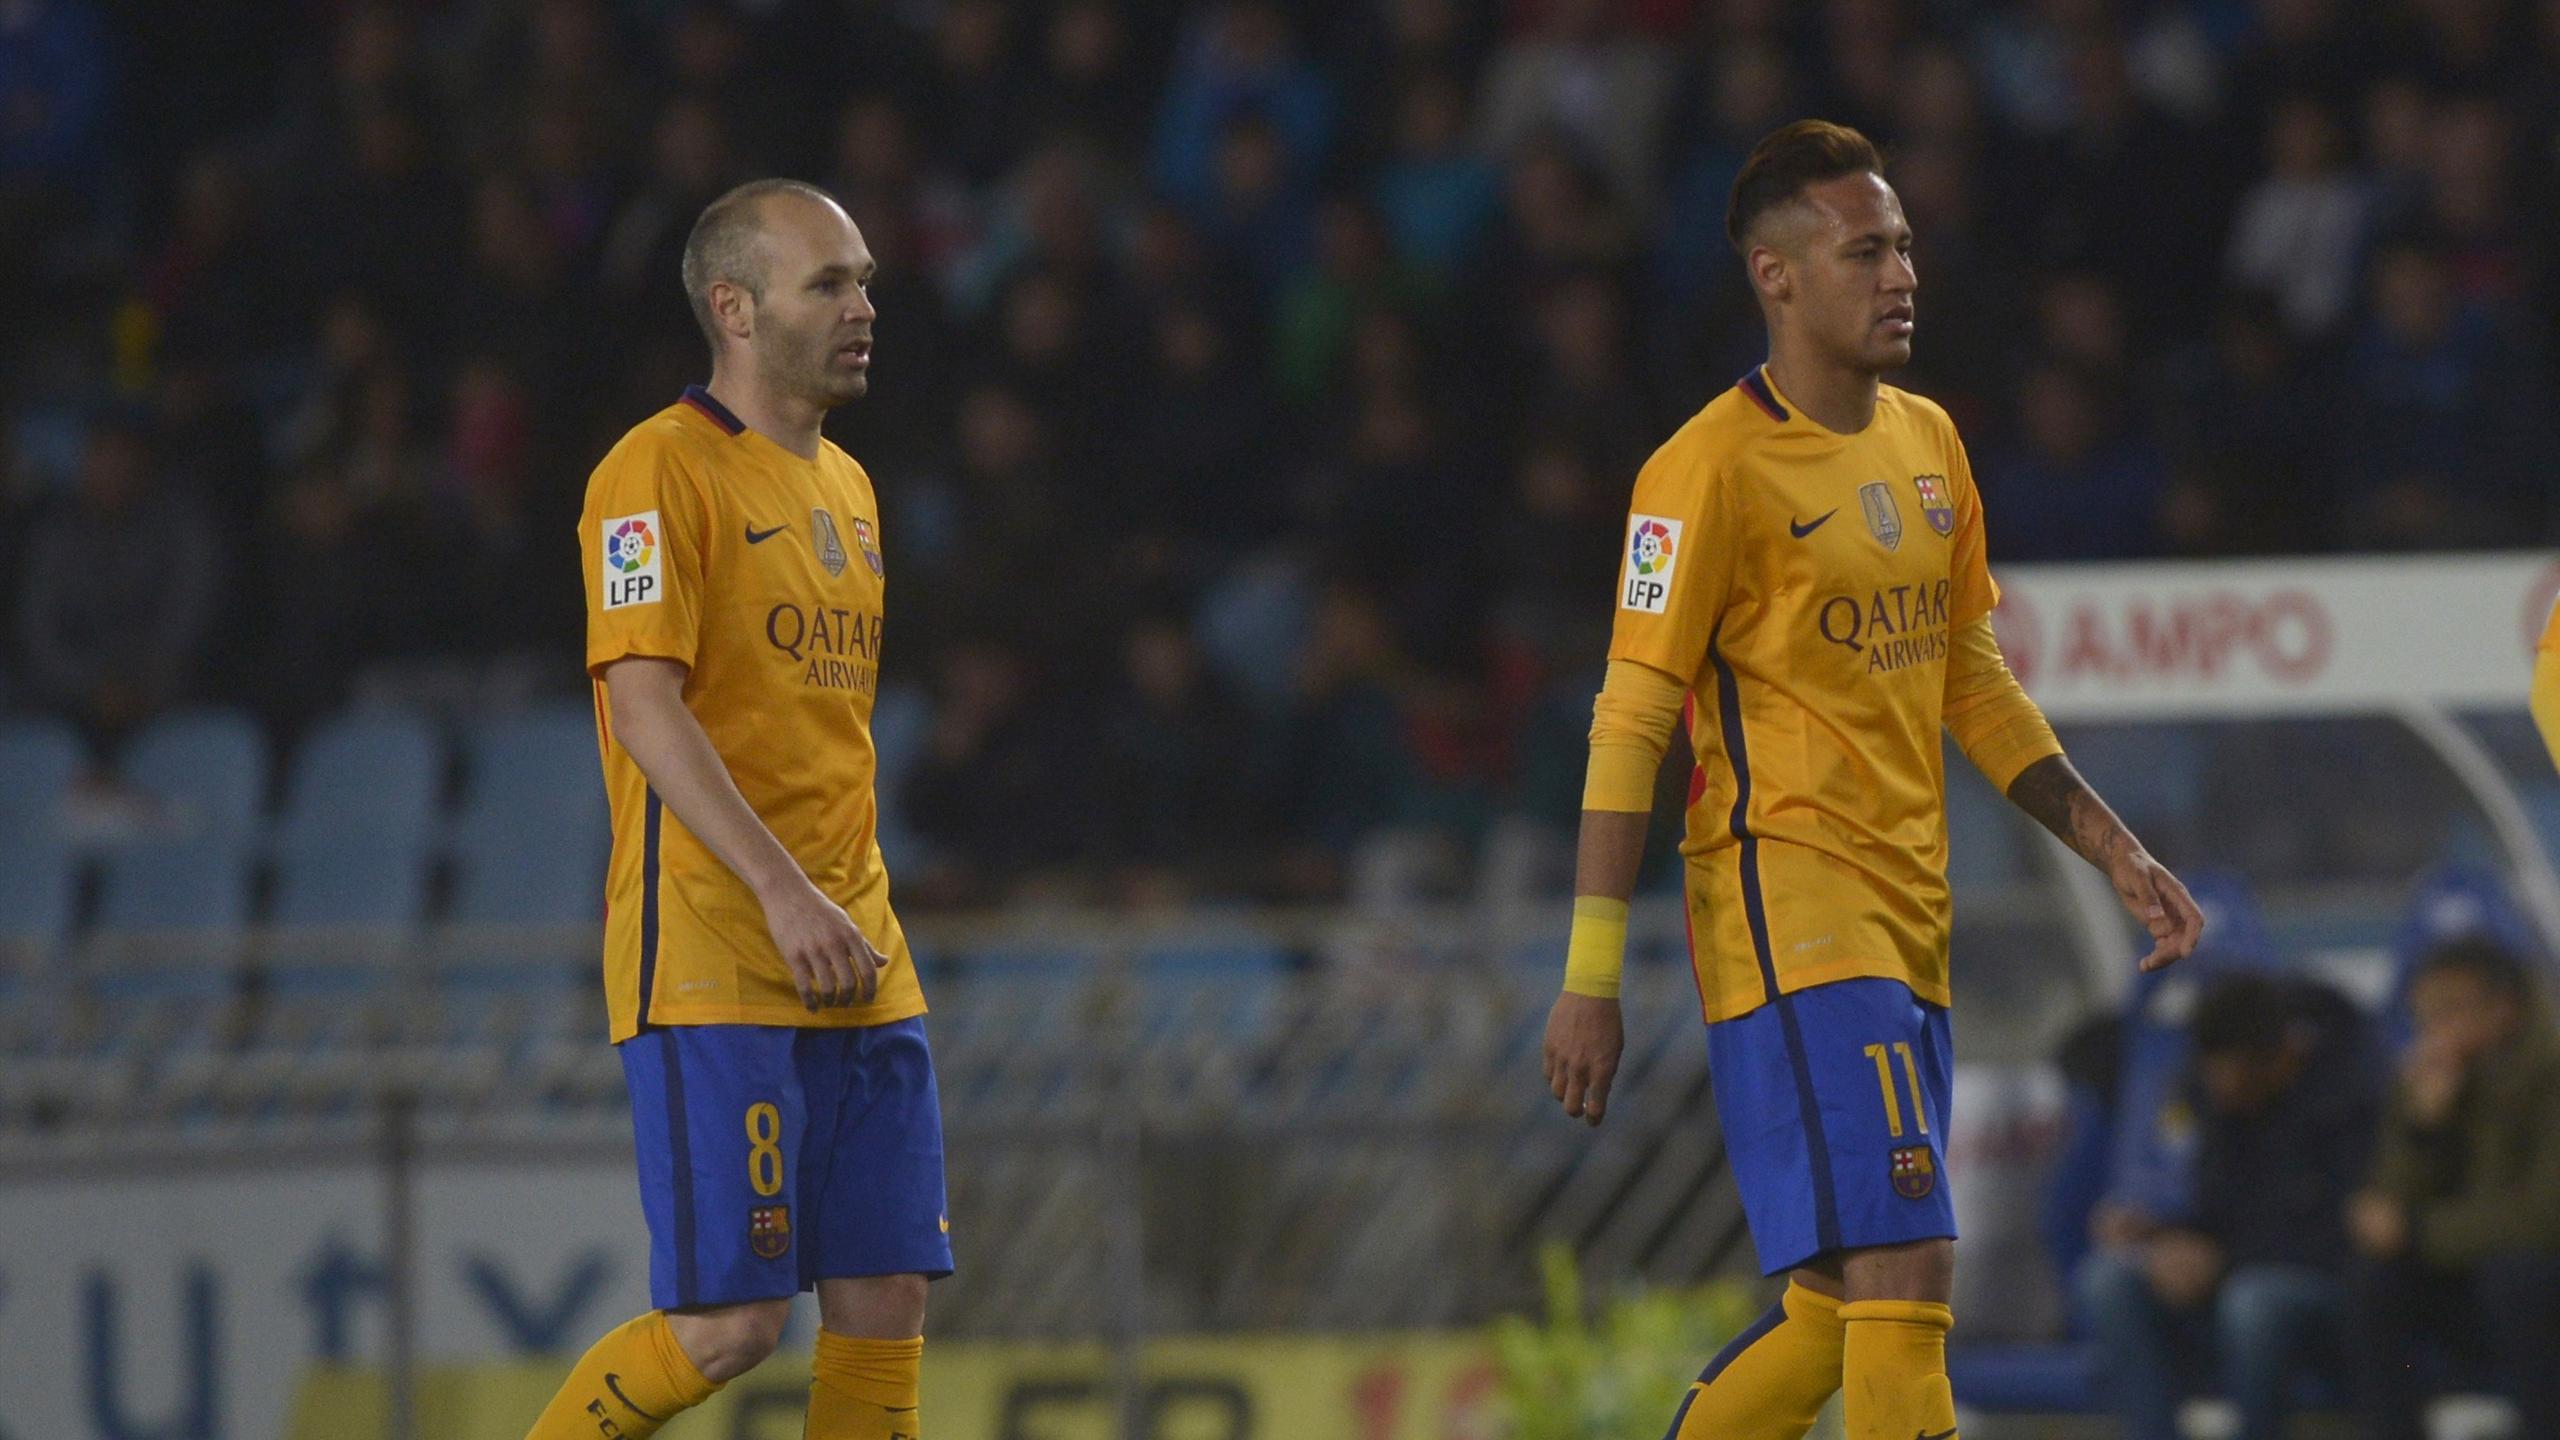 Barcelona stars Andres Iniesta and Neymar